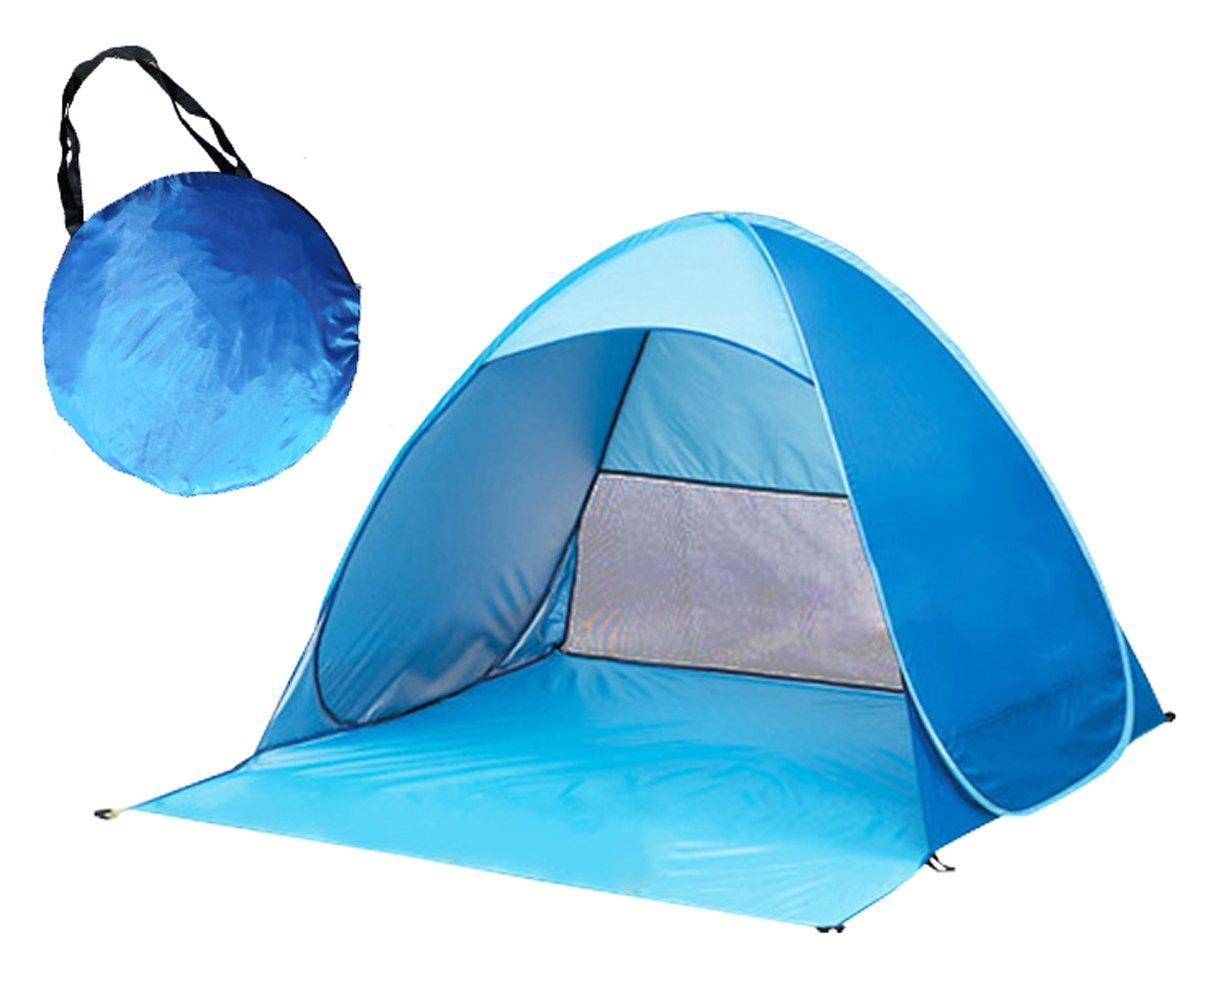 SZJH - Tente de plage instantanée anti-UV (50+ UPF) HW0002 Green 65*59*43.3